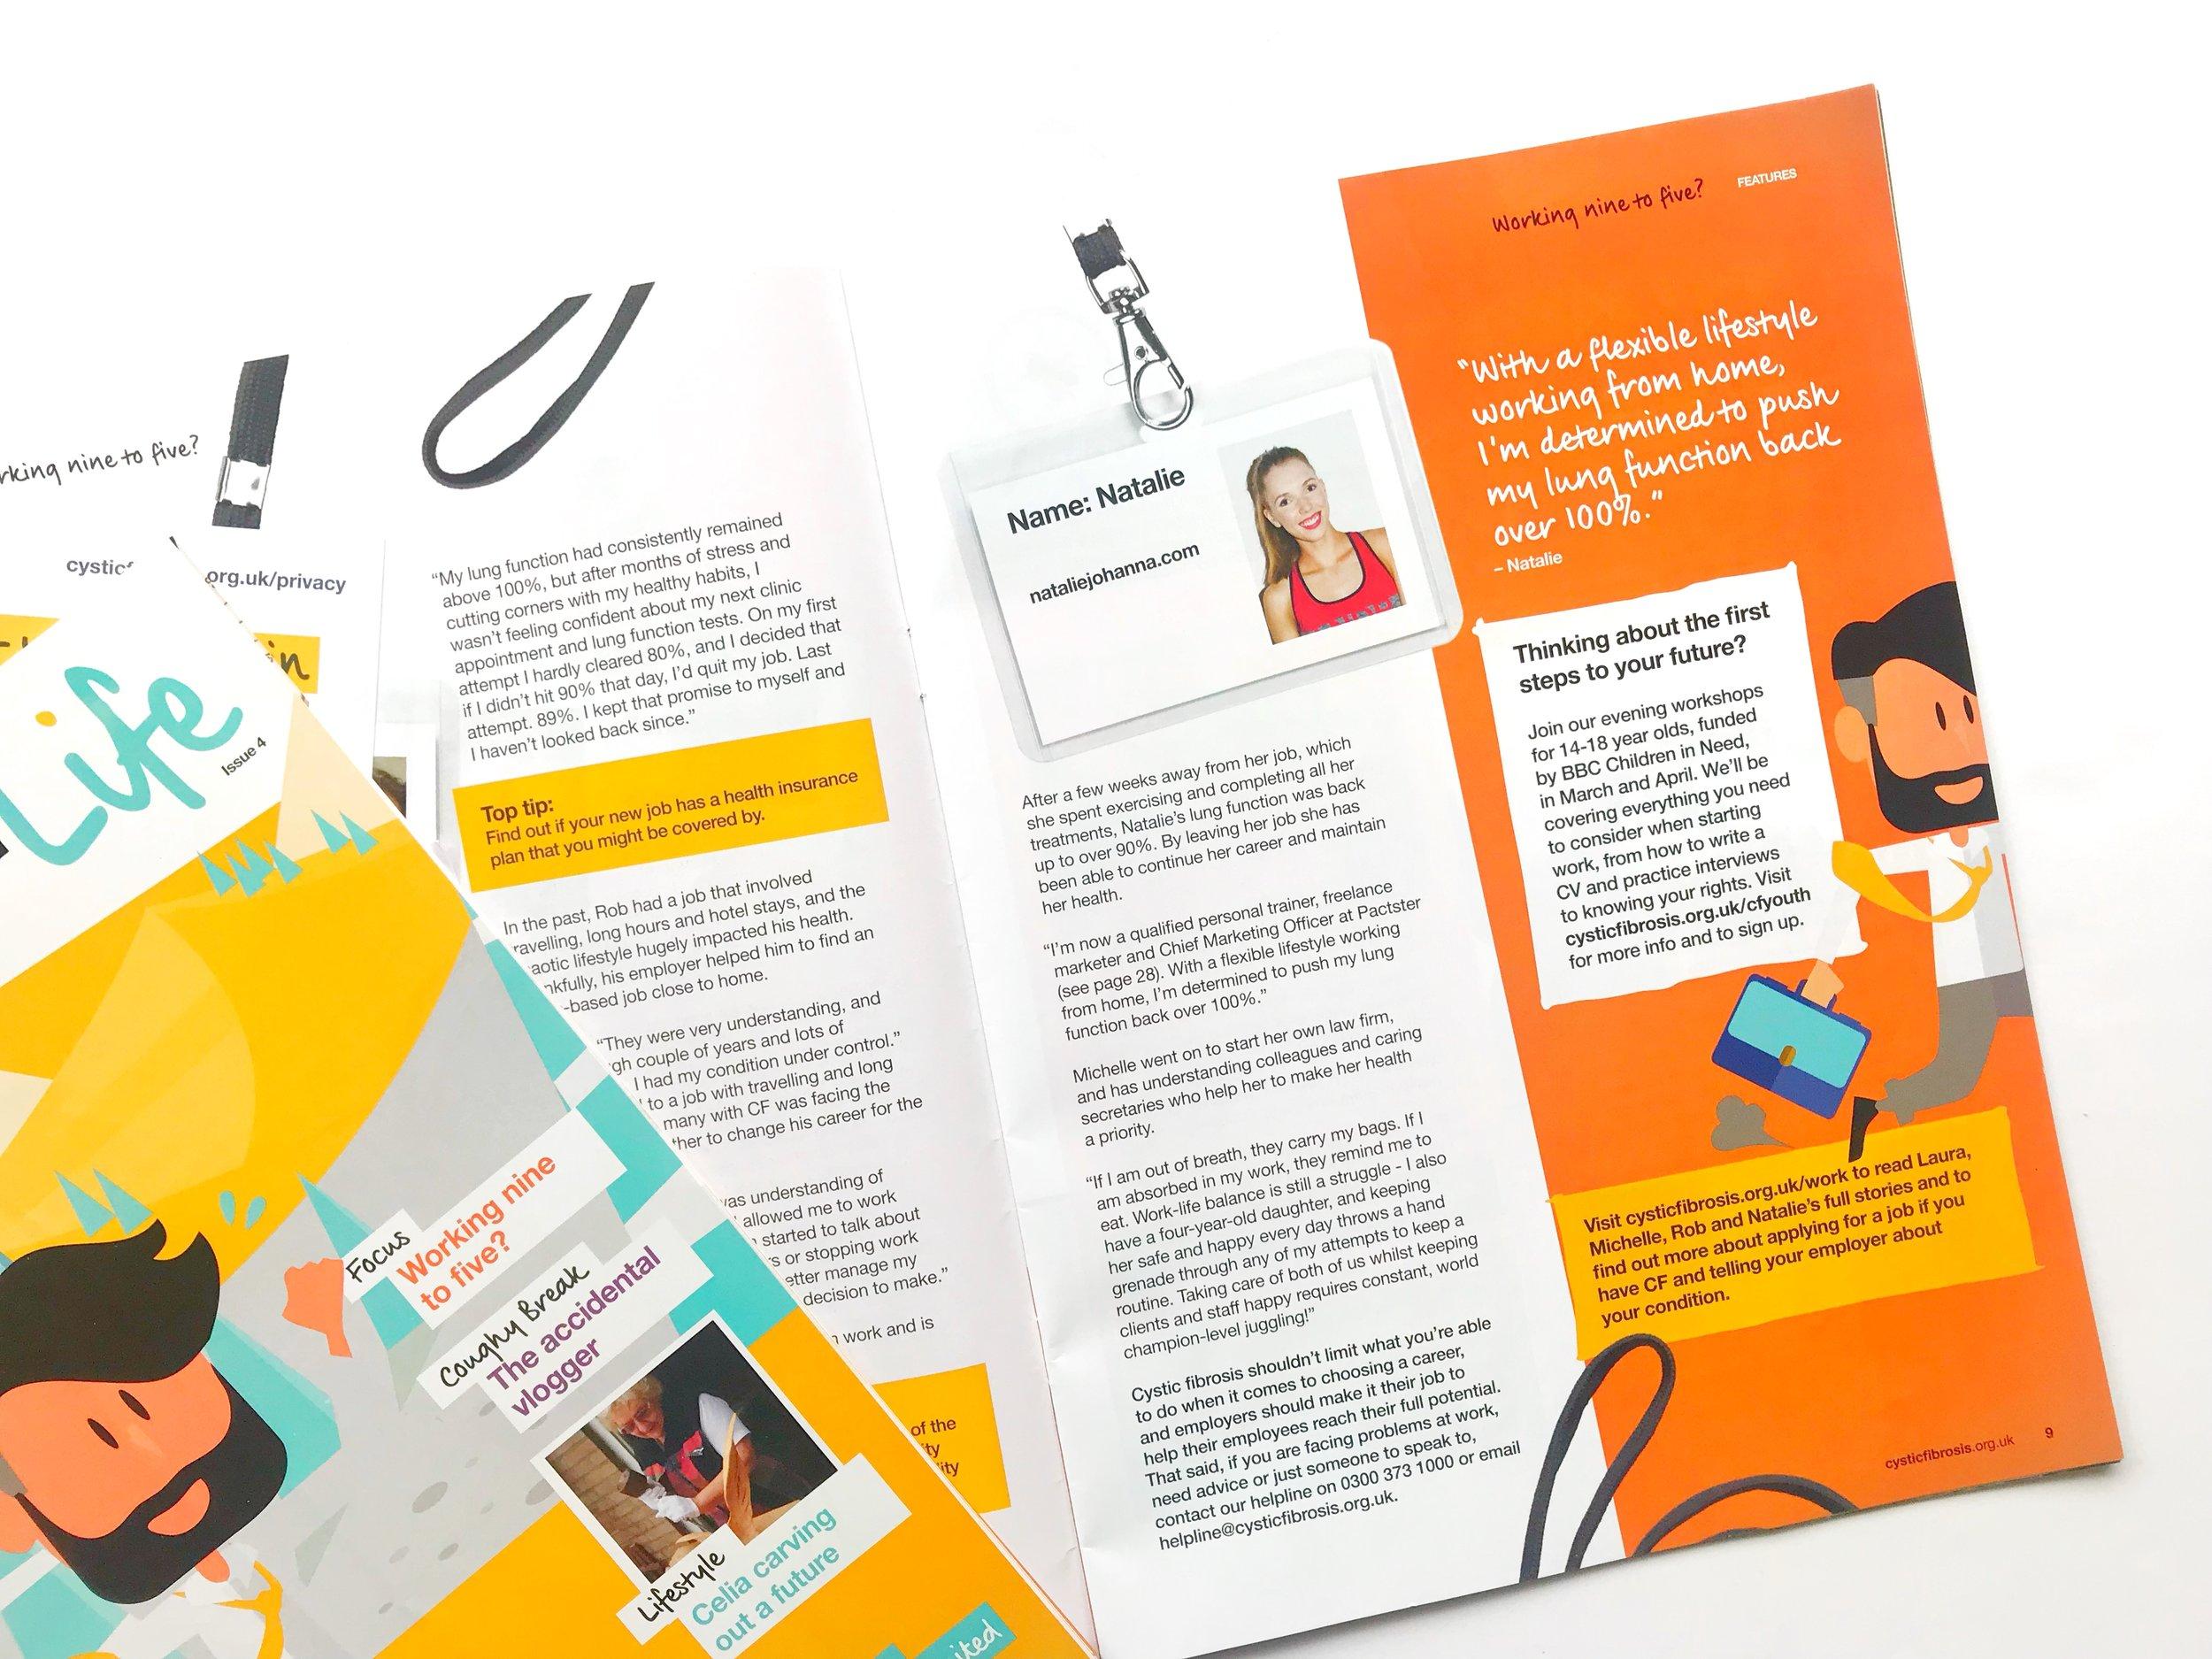 Cystic-Fibrosis-CF-Life-Magazine-Work-Career-Article-Natalie-Goodchild-health